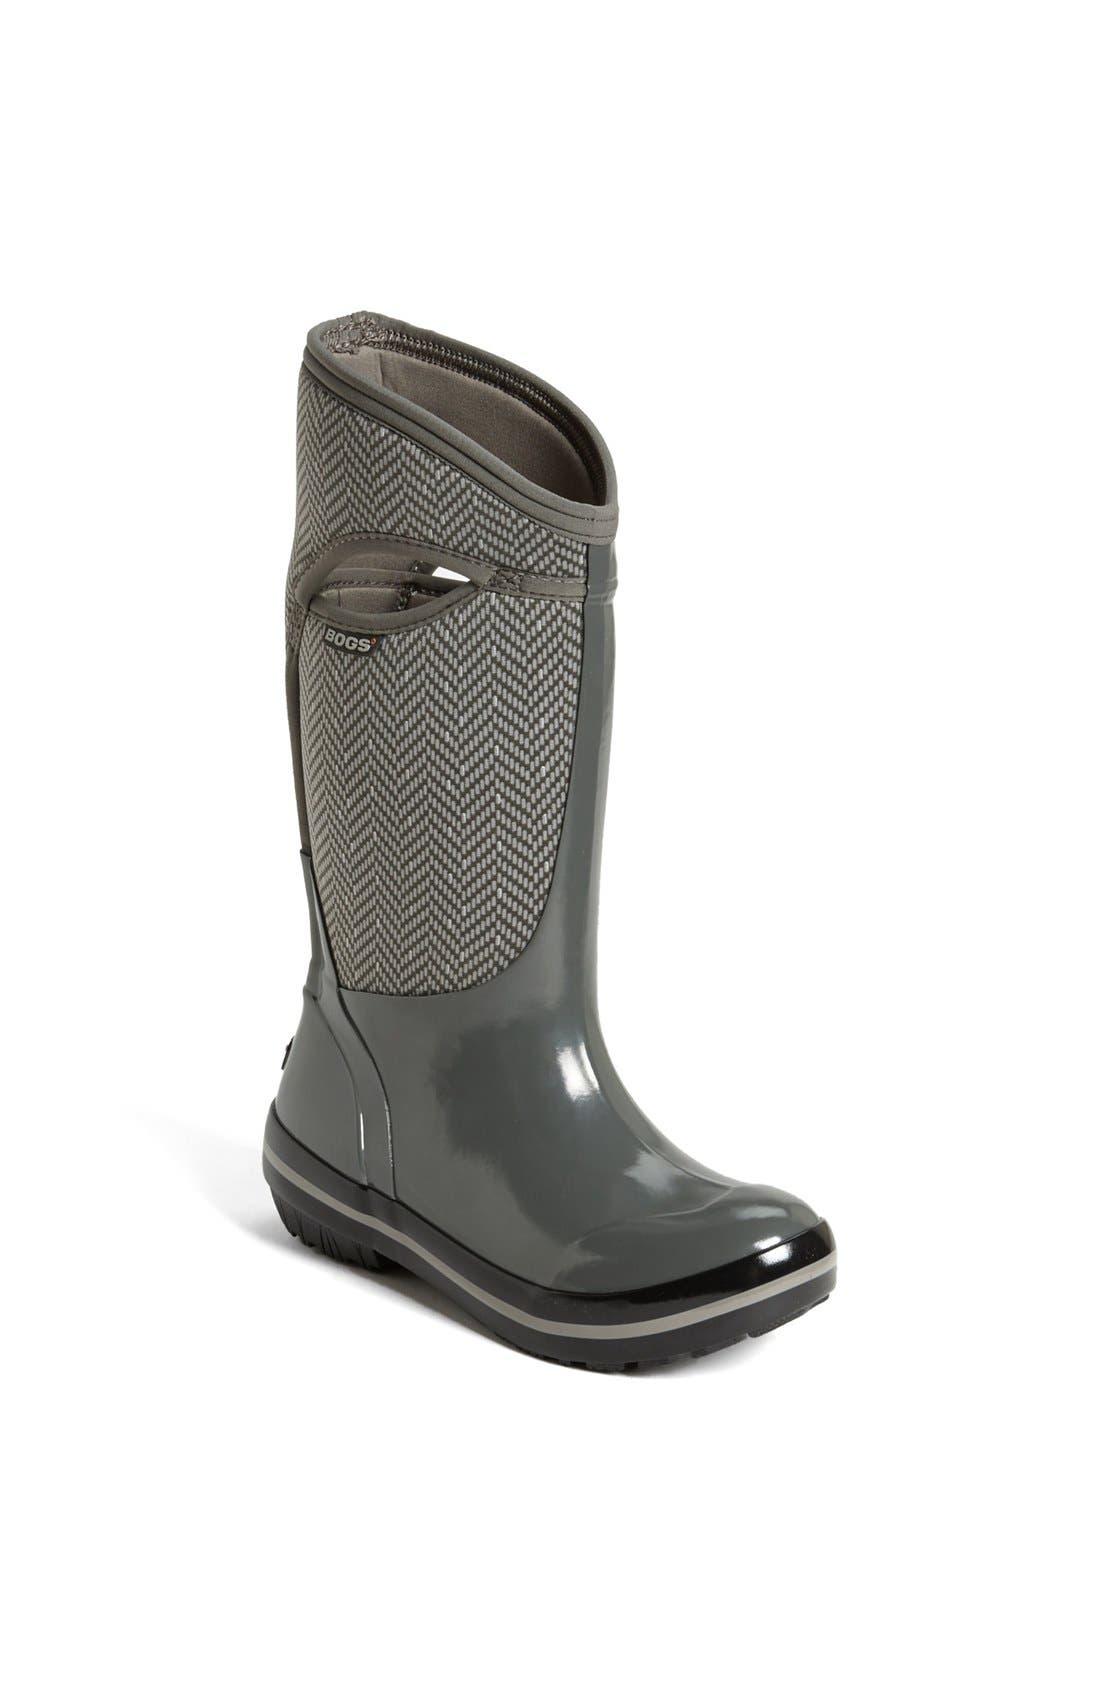 Main Image - Bogs 'Plimsoll' Tall Rain Boot (Women)